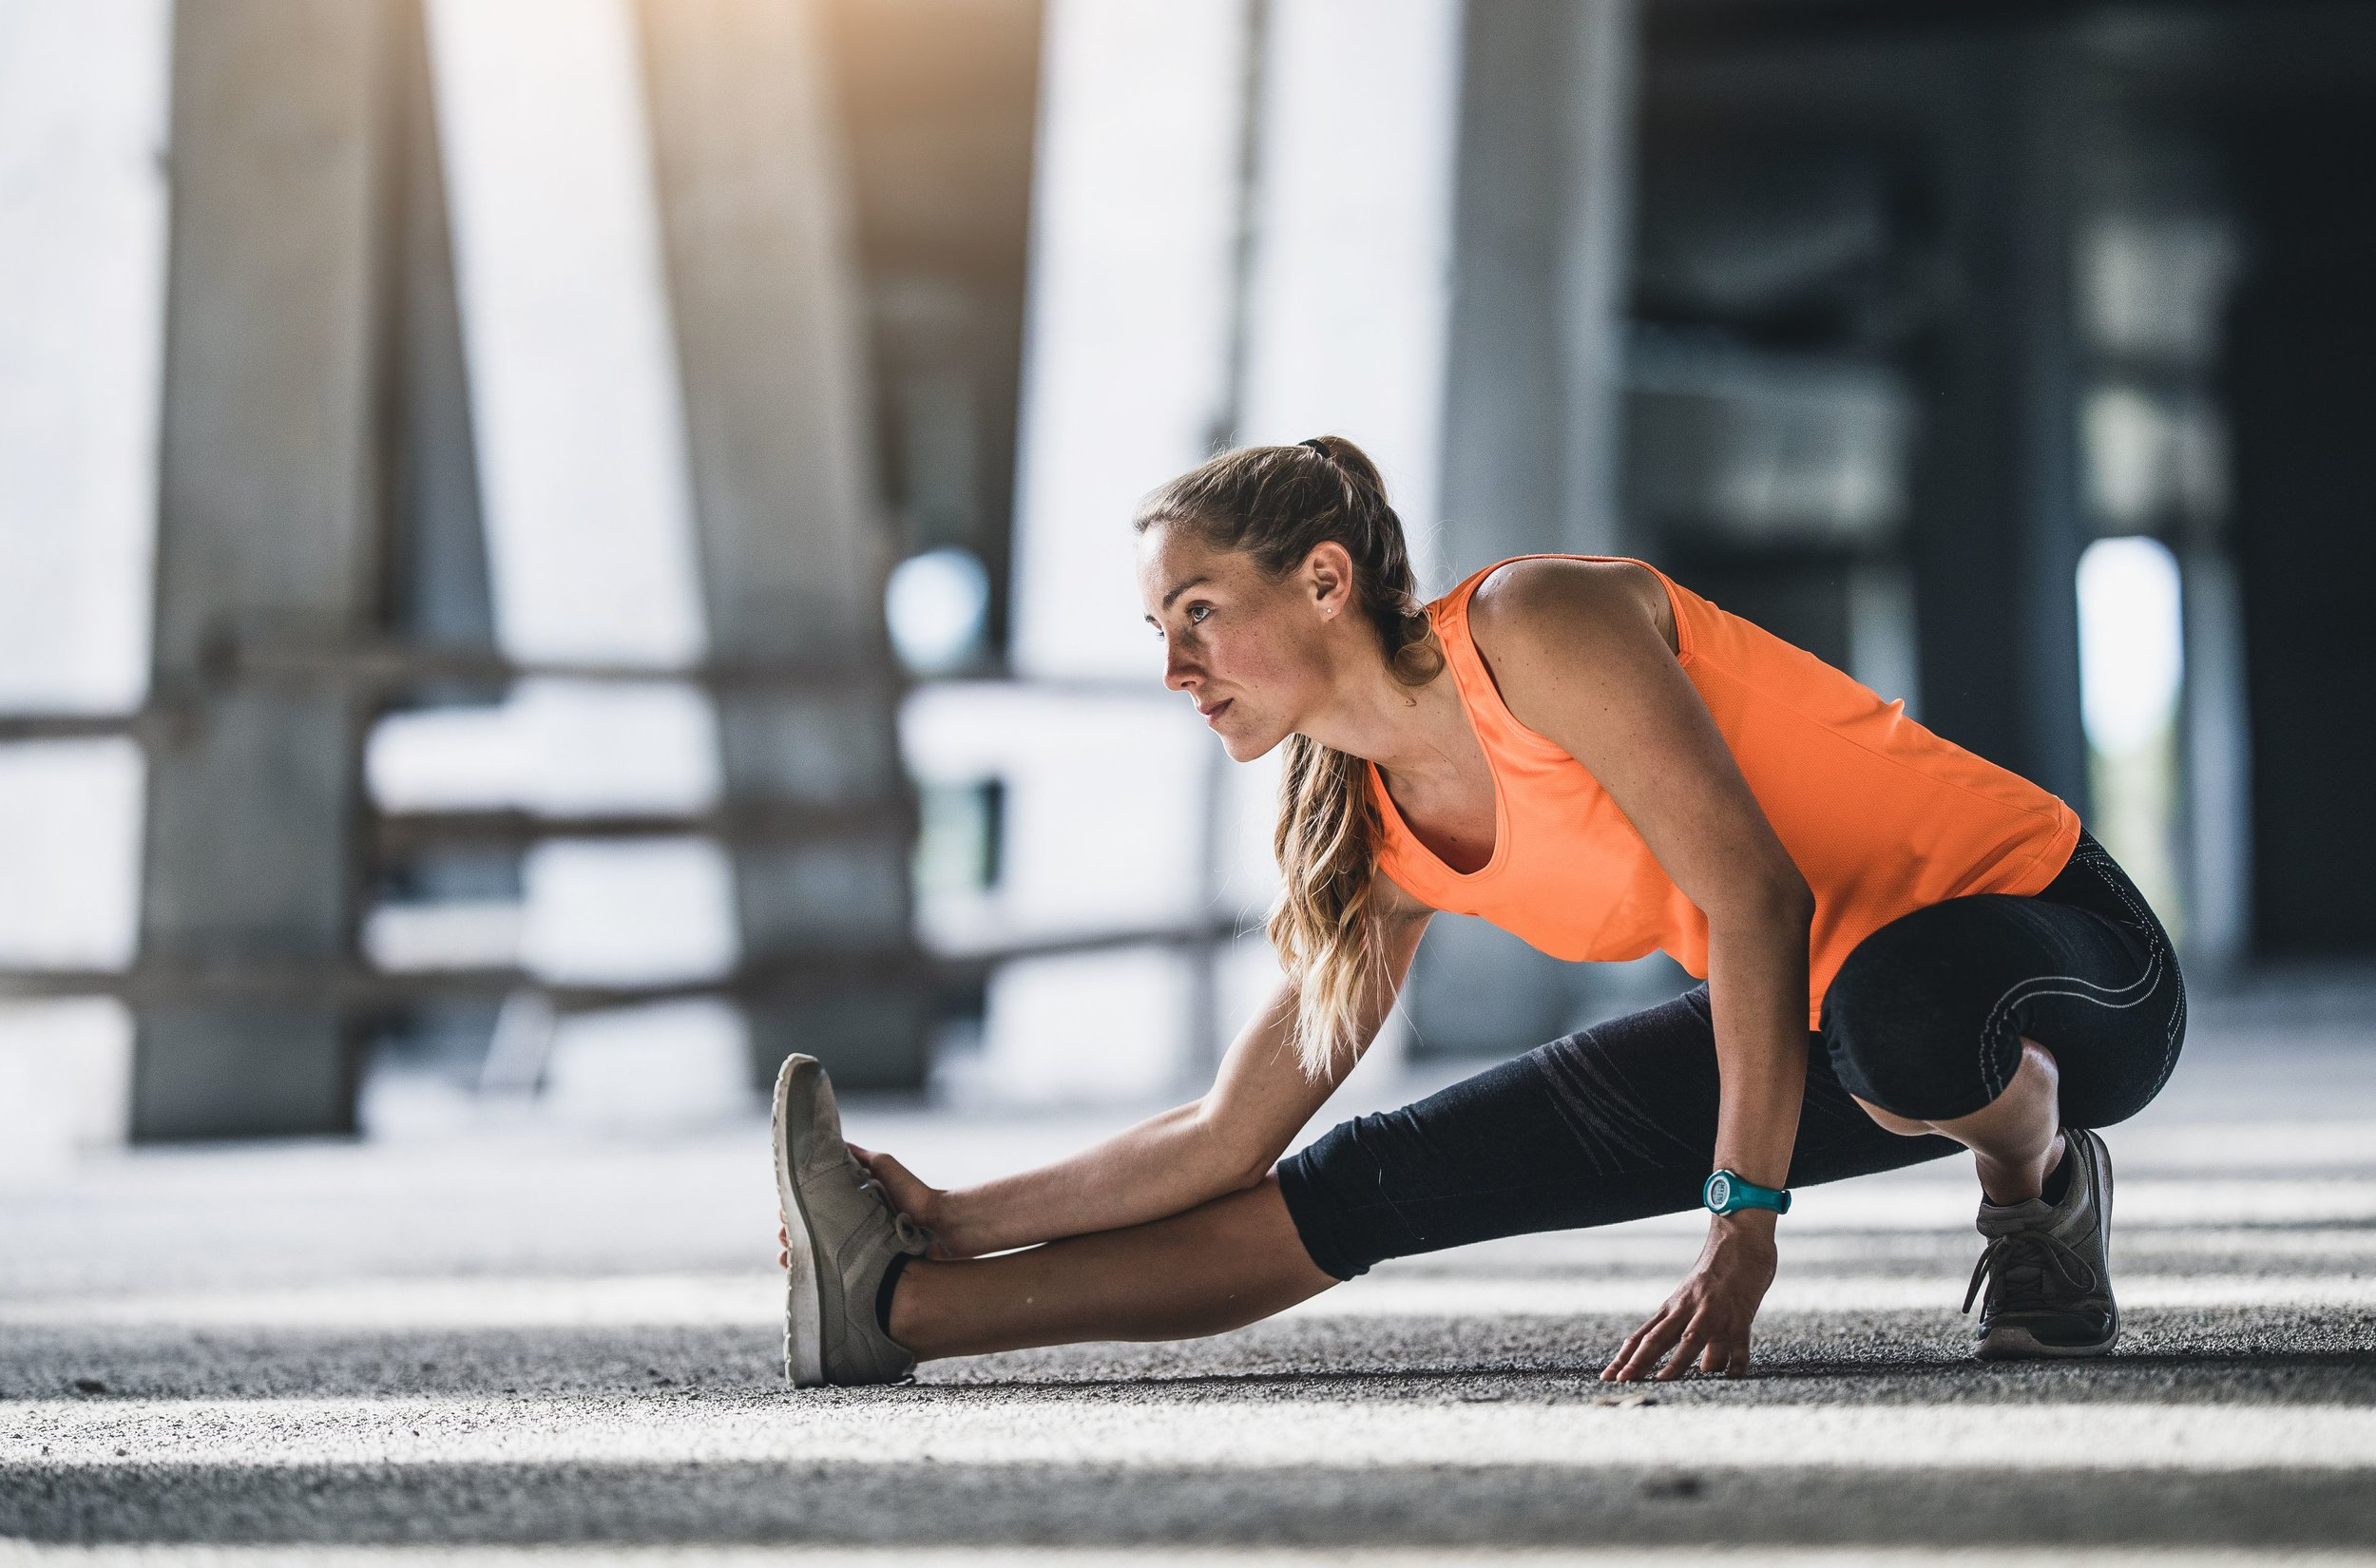 female-athlete-stretching-outdoors-royalty-free-image-810679678-1534524159.jpg